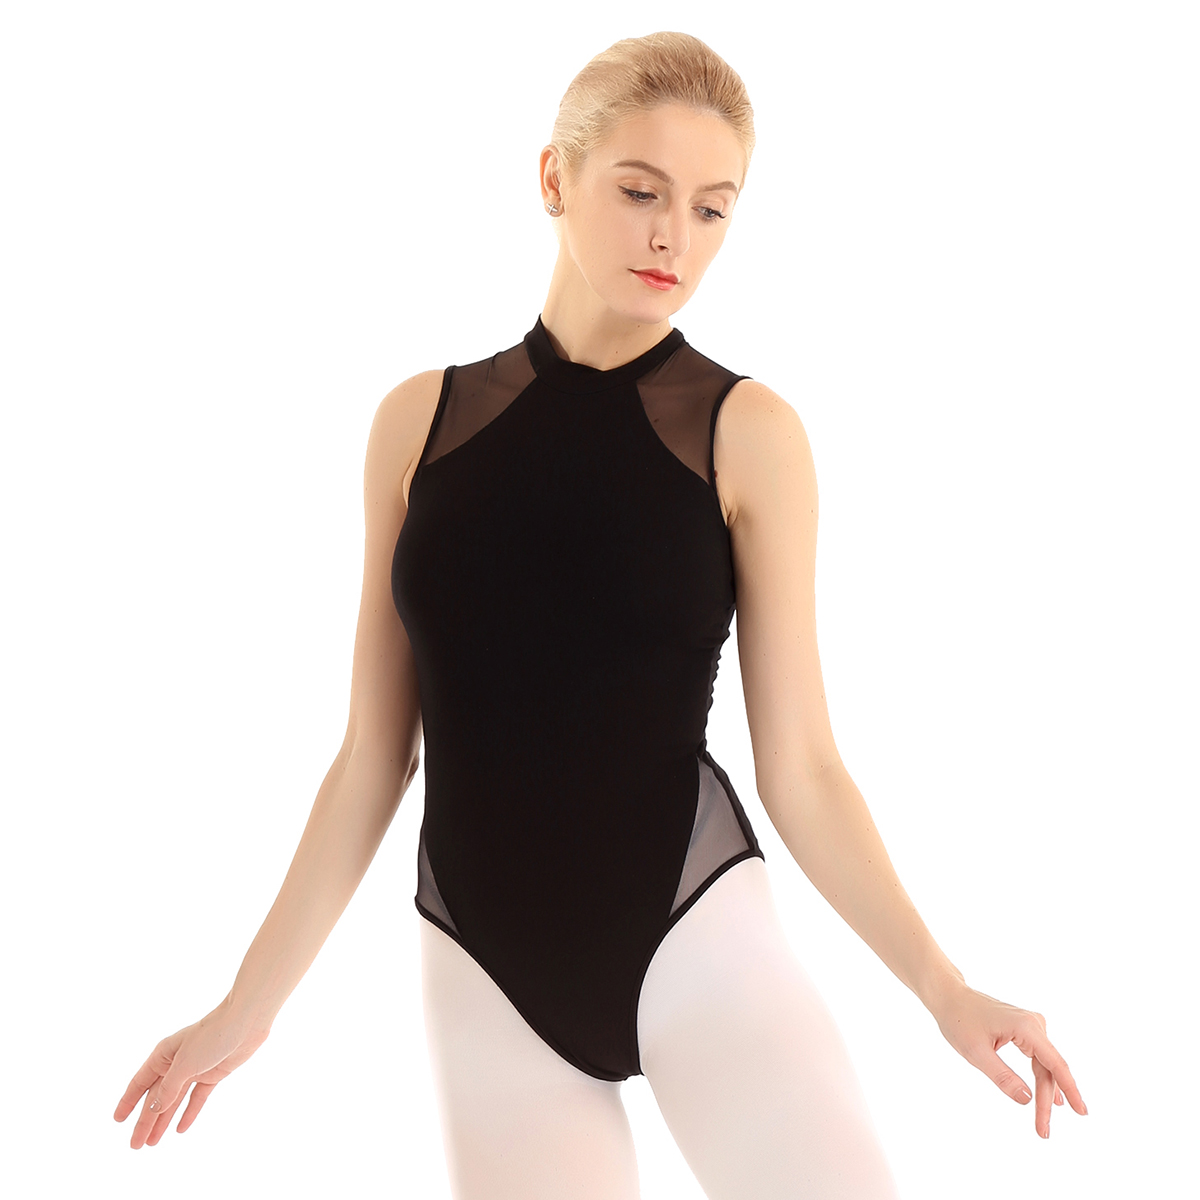 Girls Ballet Dress Gymnastics Leotards Mesh Splice Dance Wear Bodysuit Costume